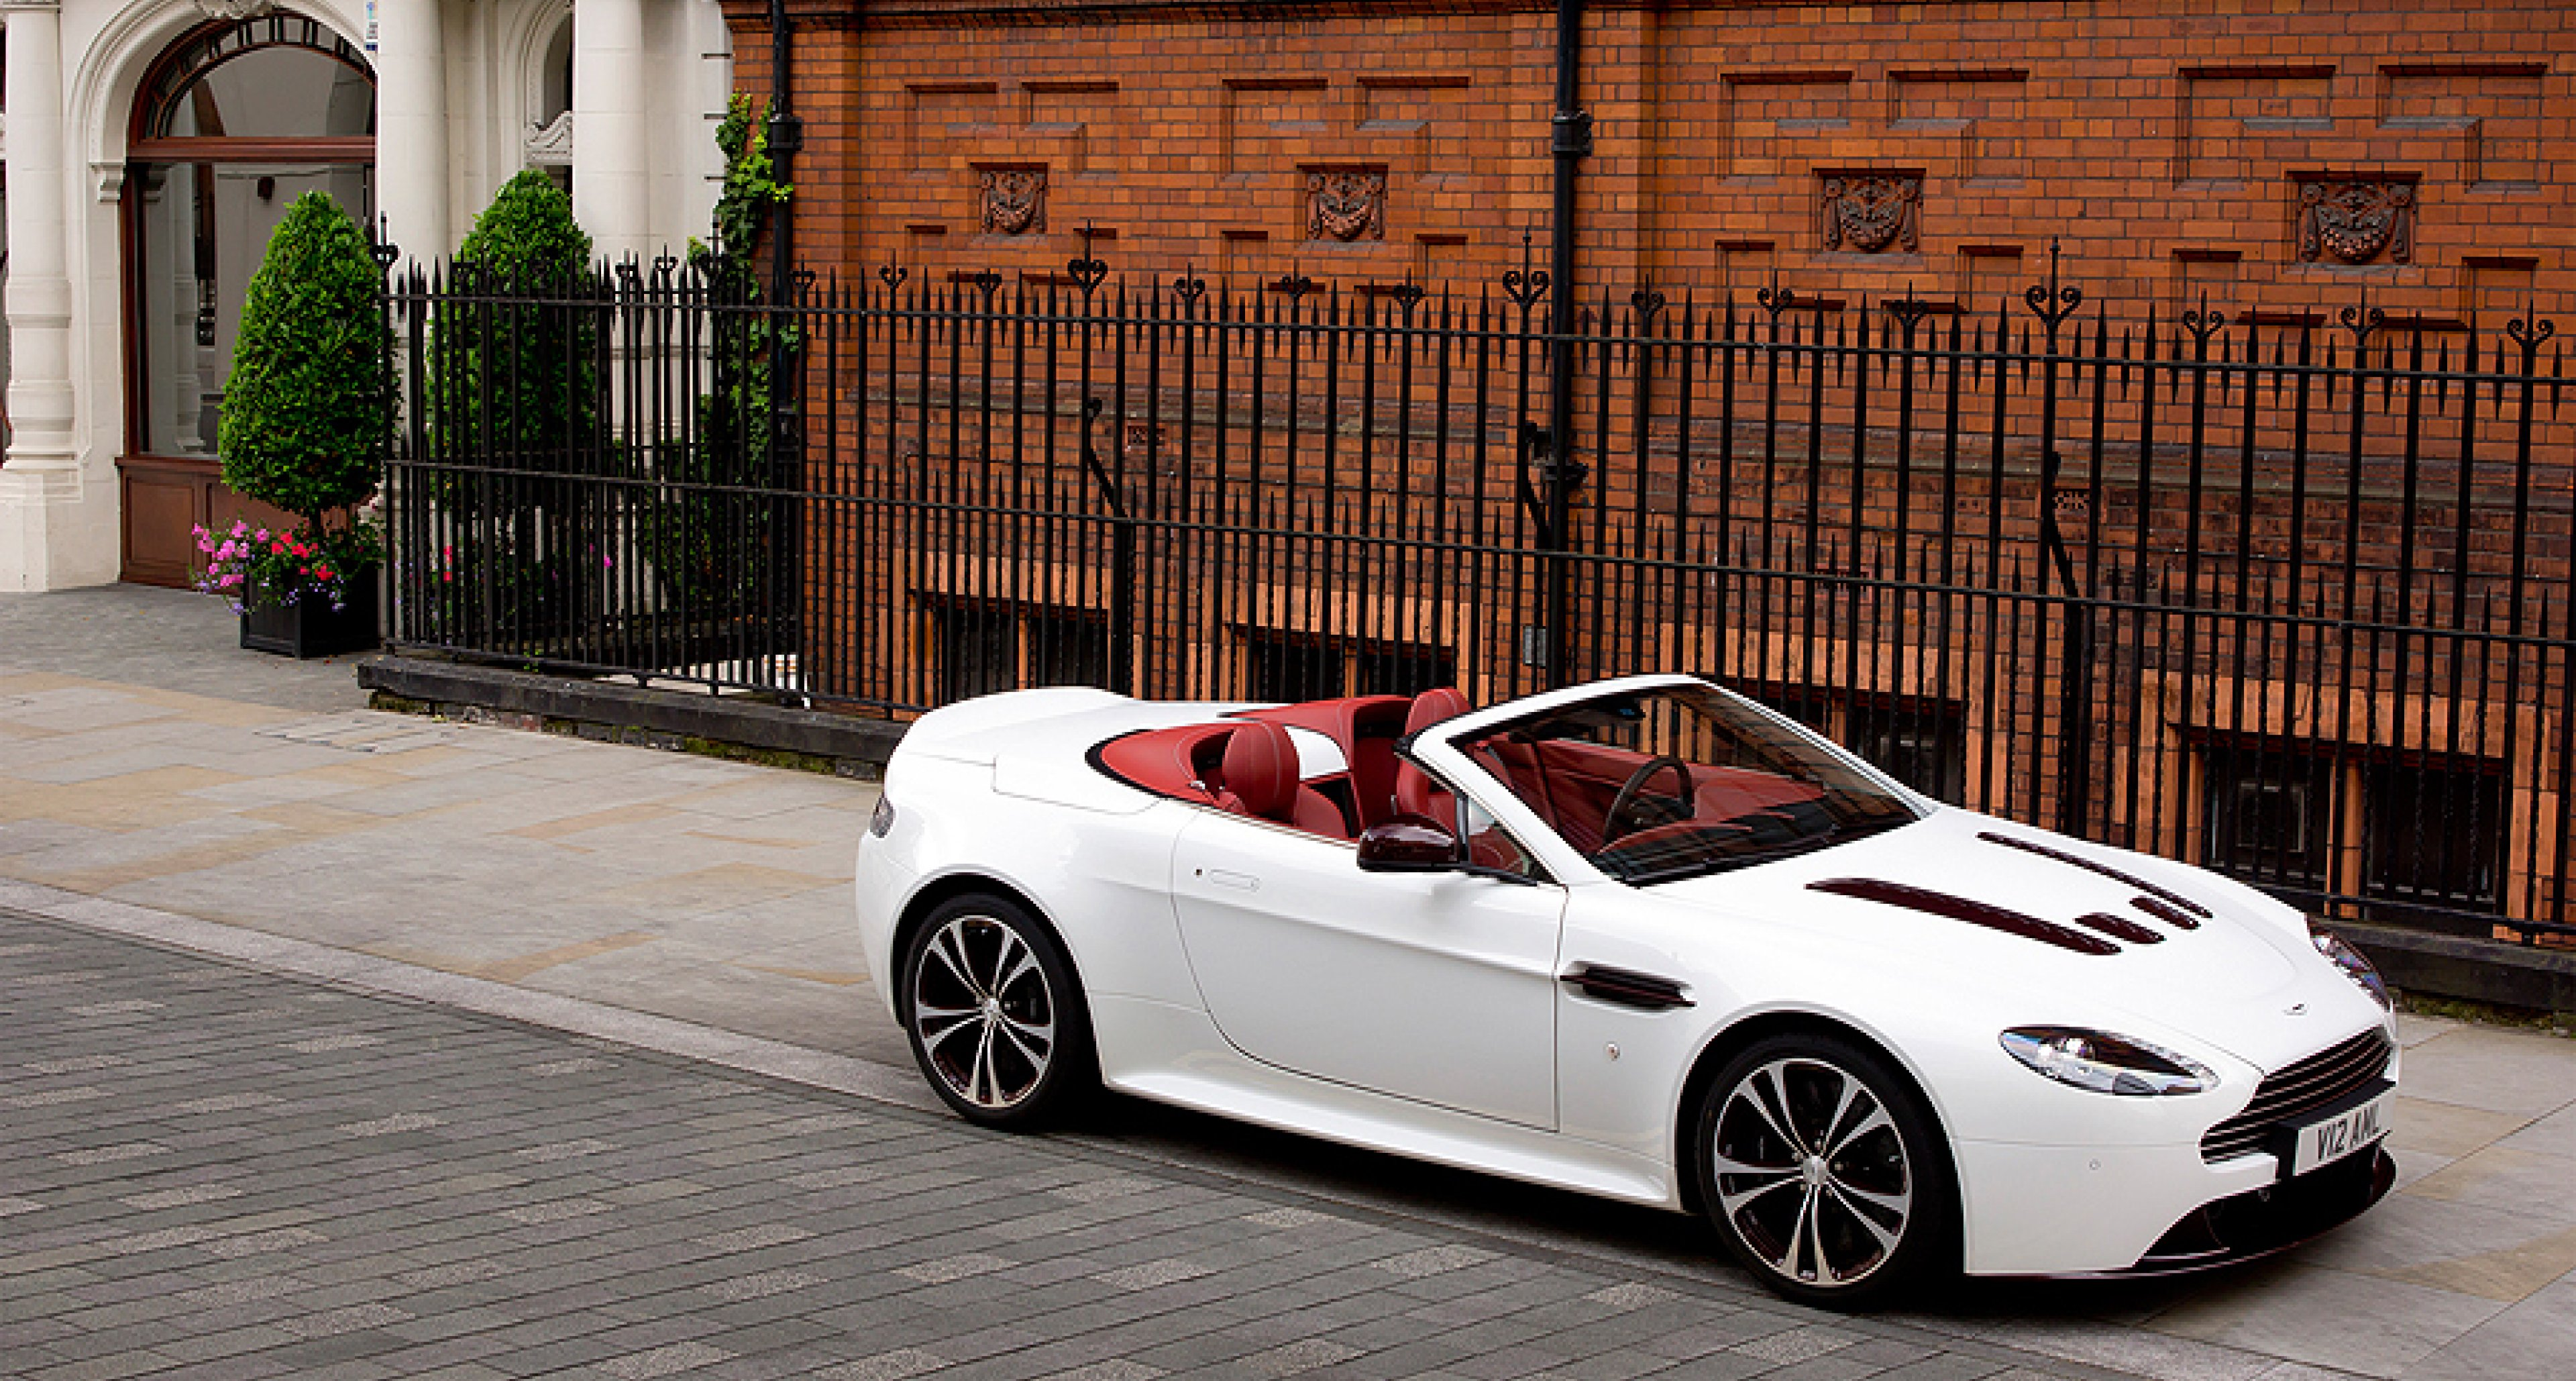 Aston Martin V12 Vantage Roadster British Air Max Classic Driver Magazine